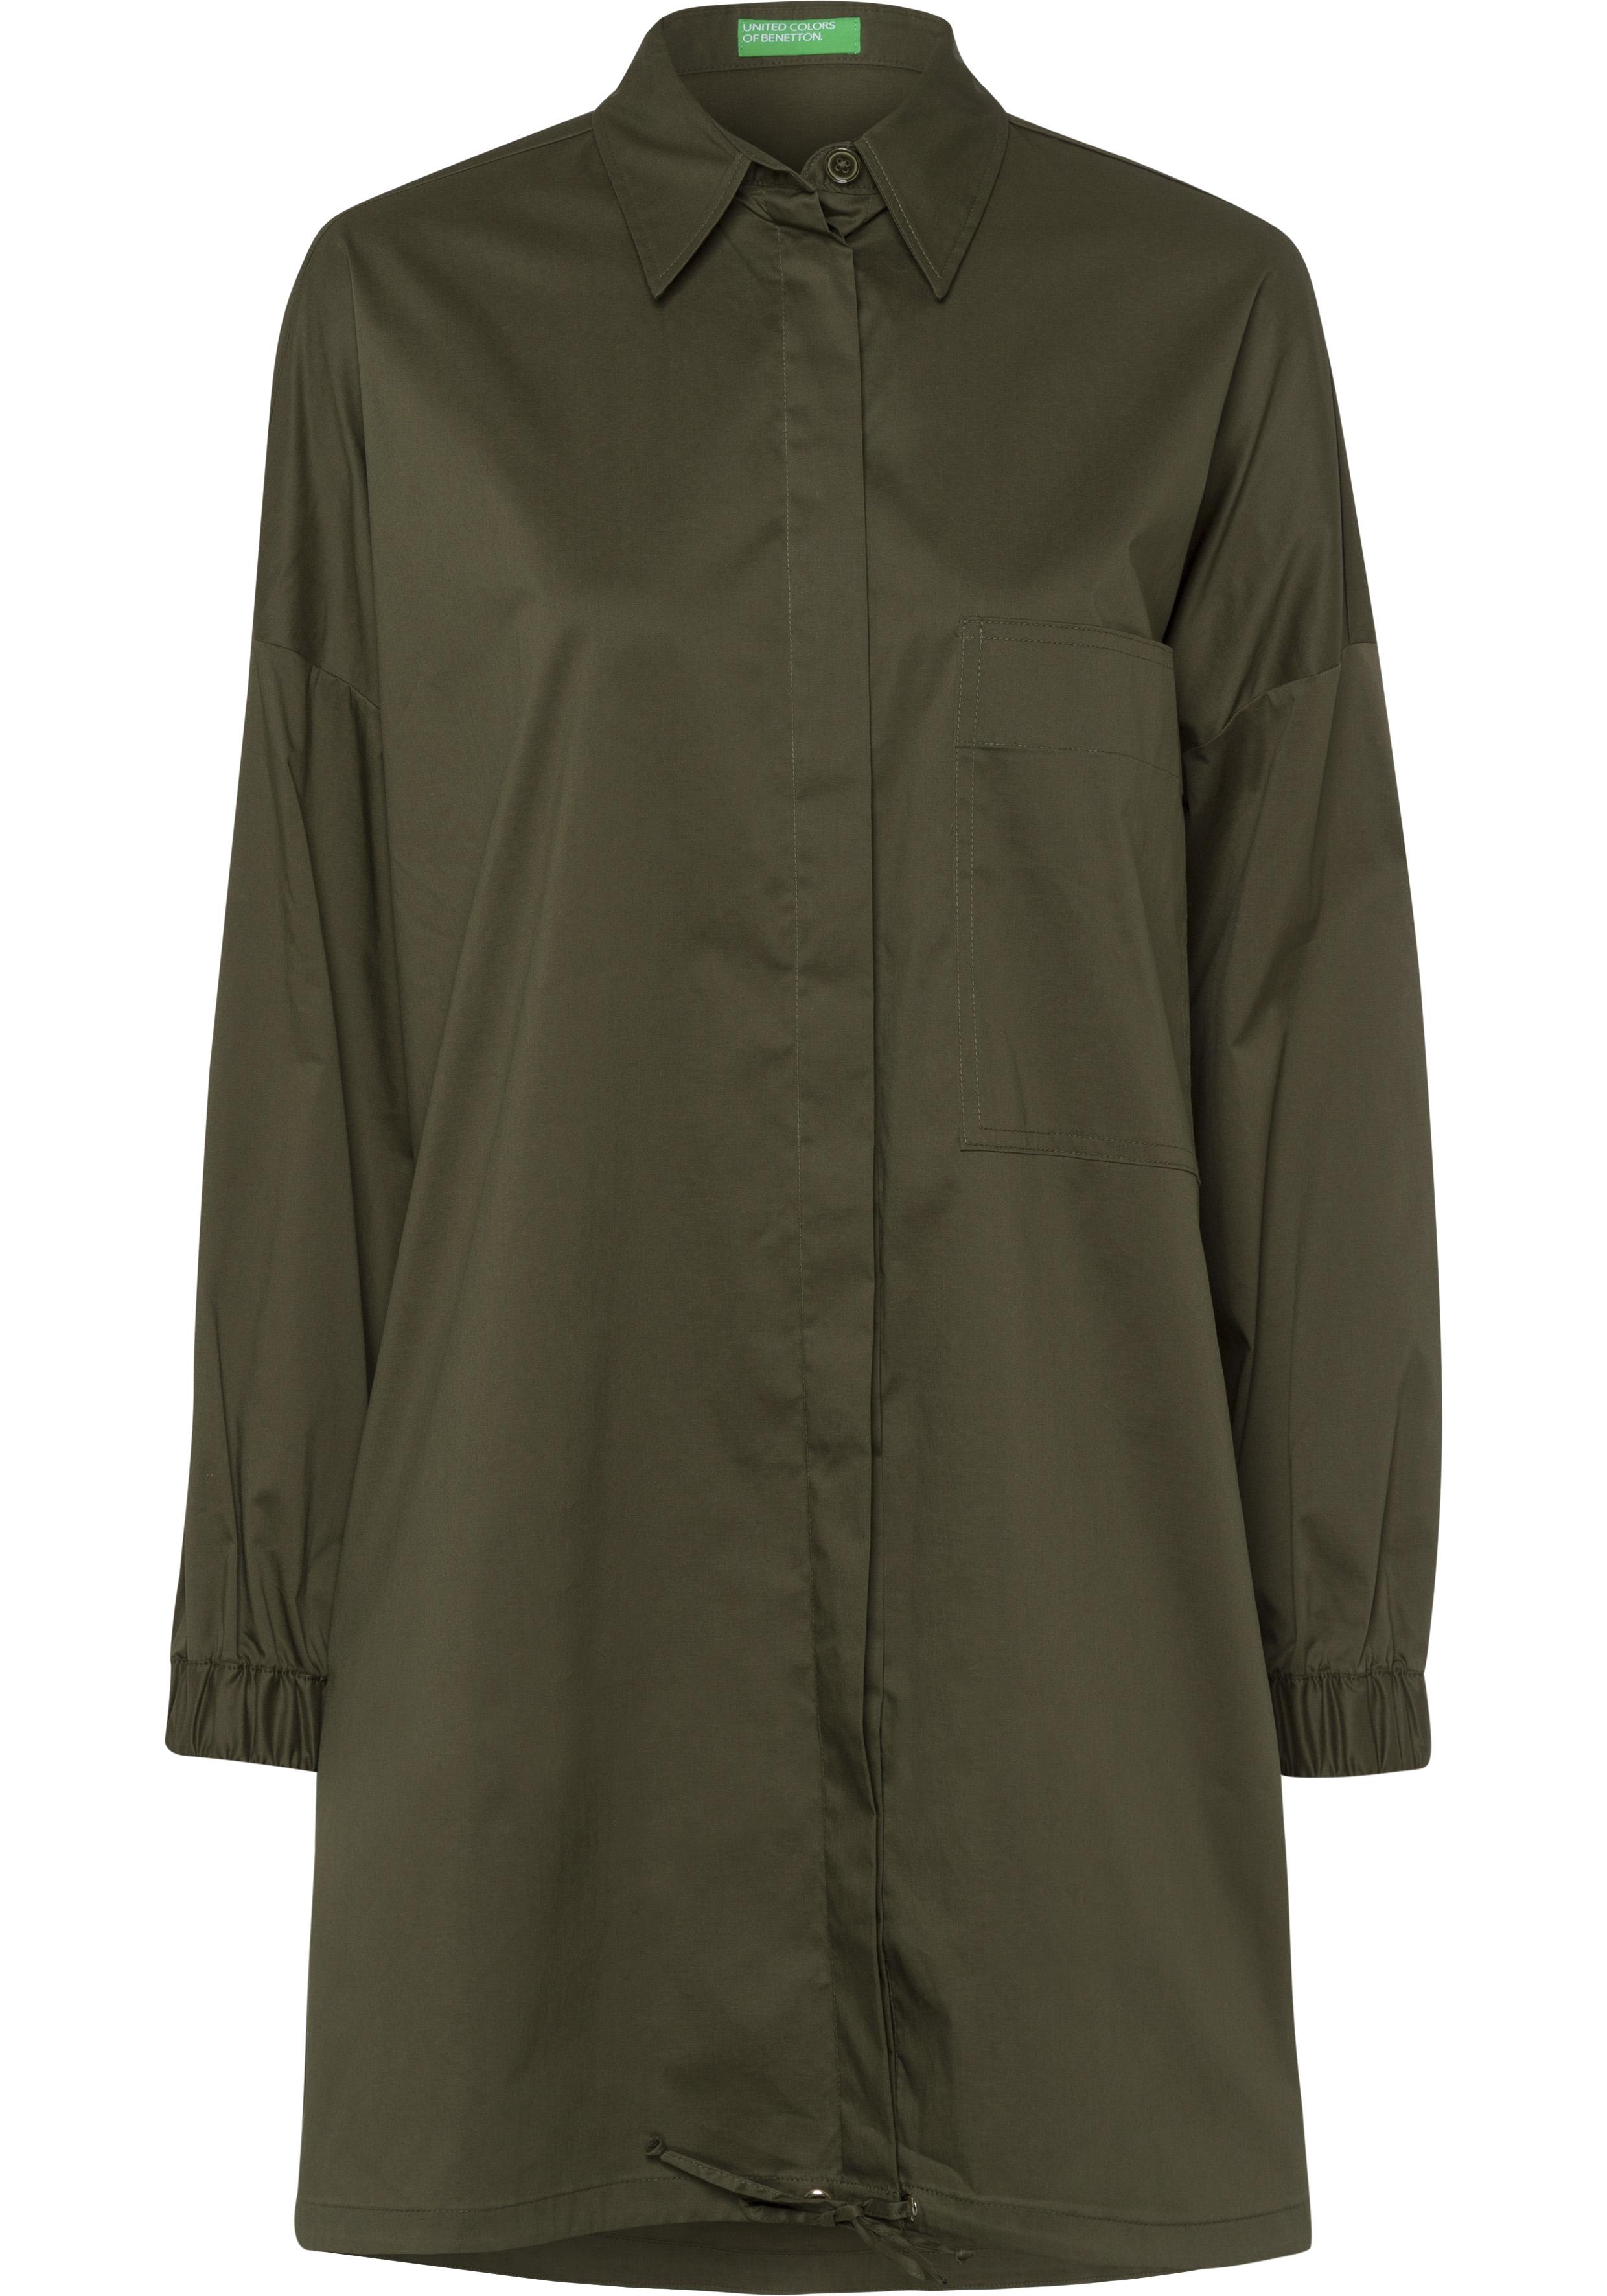 united colors of benetton -  Hemdblusenkleid, mit geraffter Rückenpassennaht